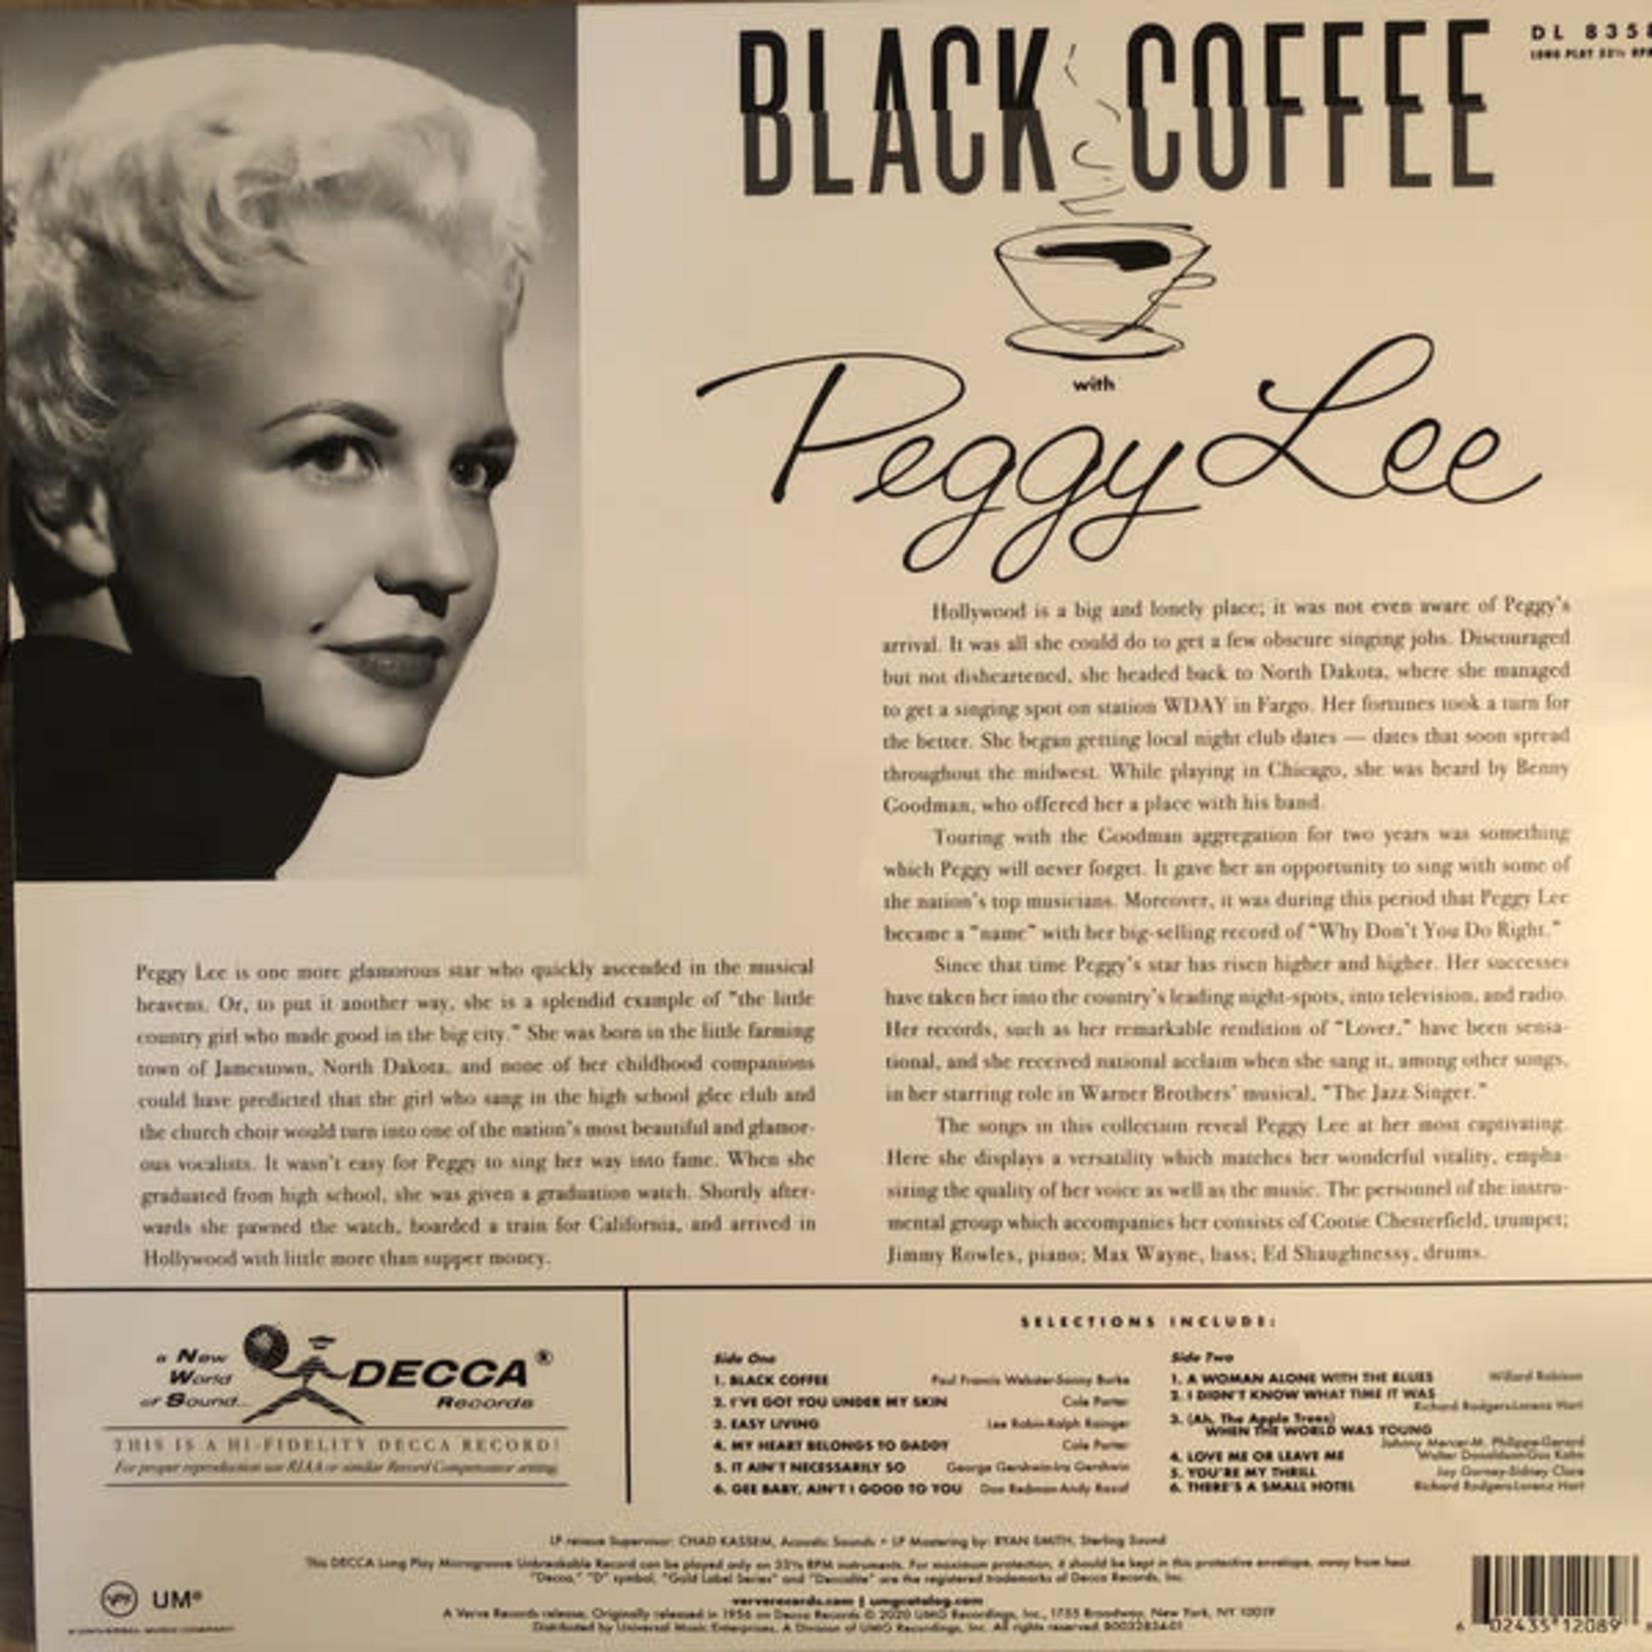 PEGGY LEE BLACK COFFEE (ACOUSTIC/LP)